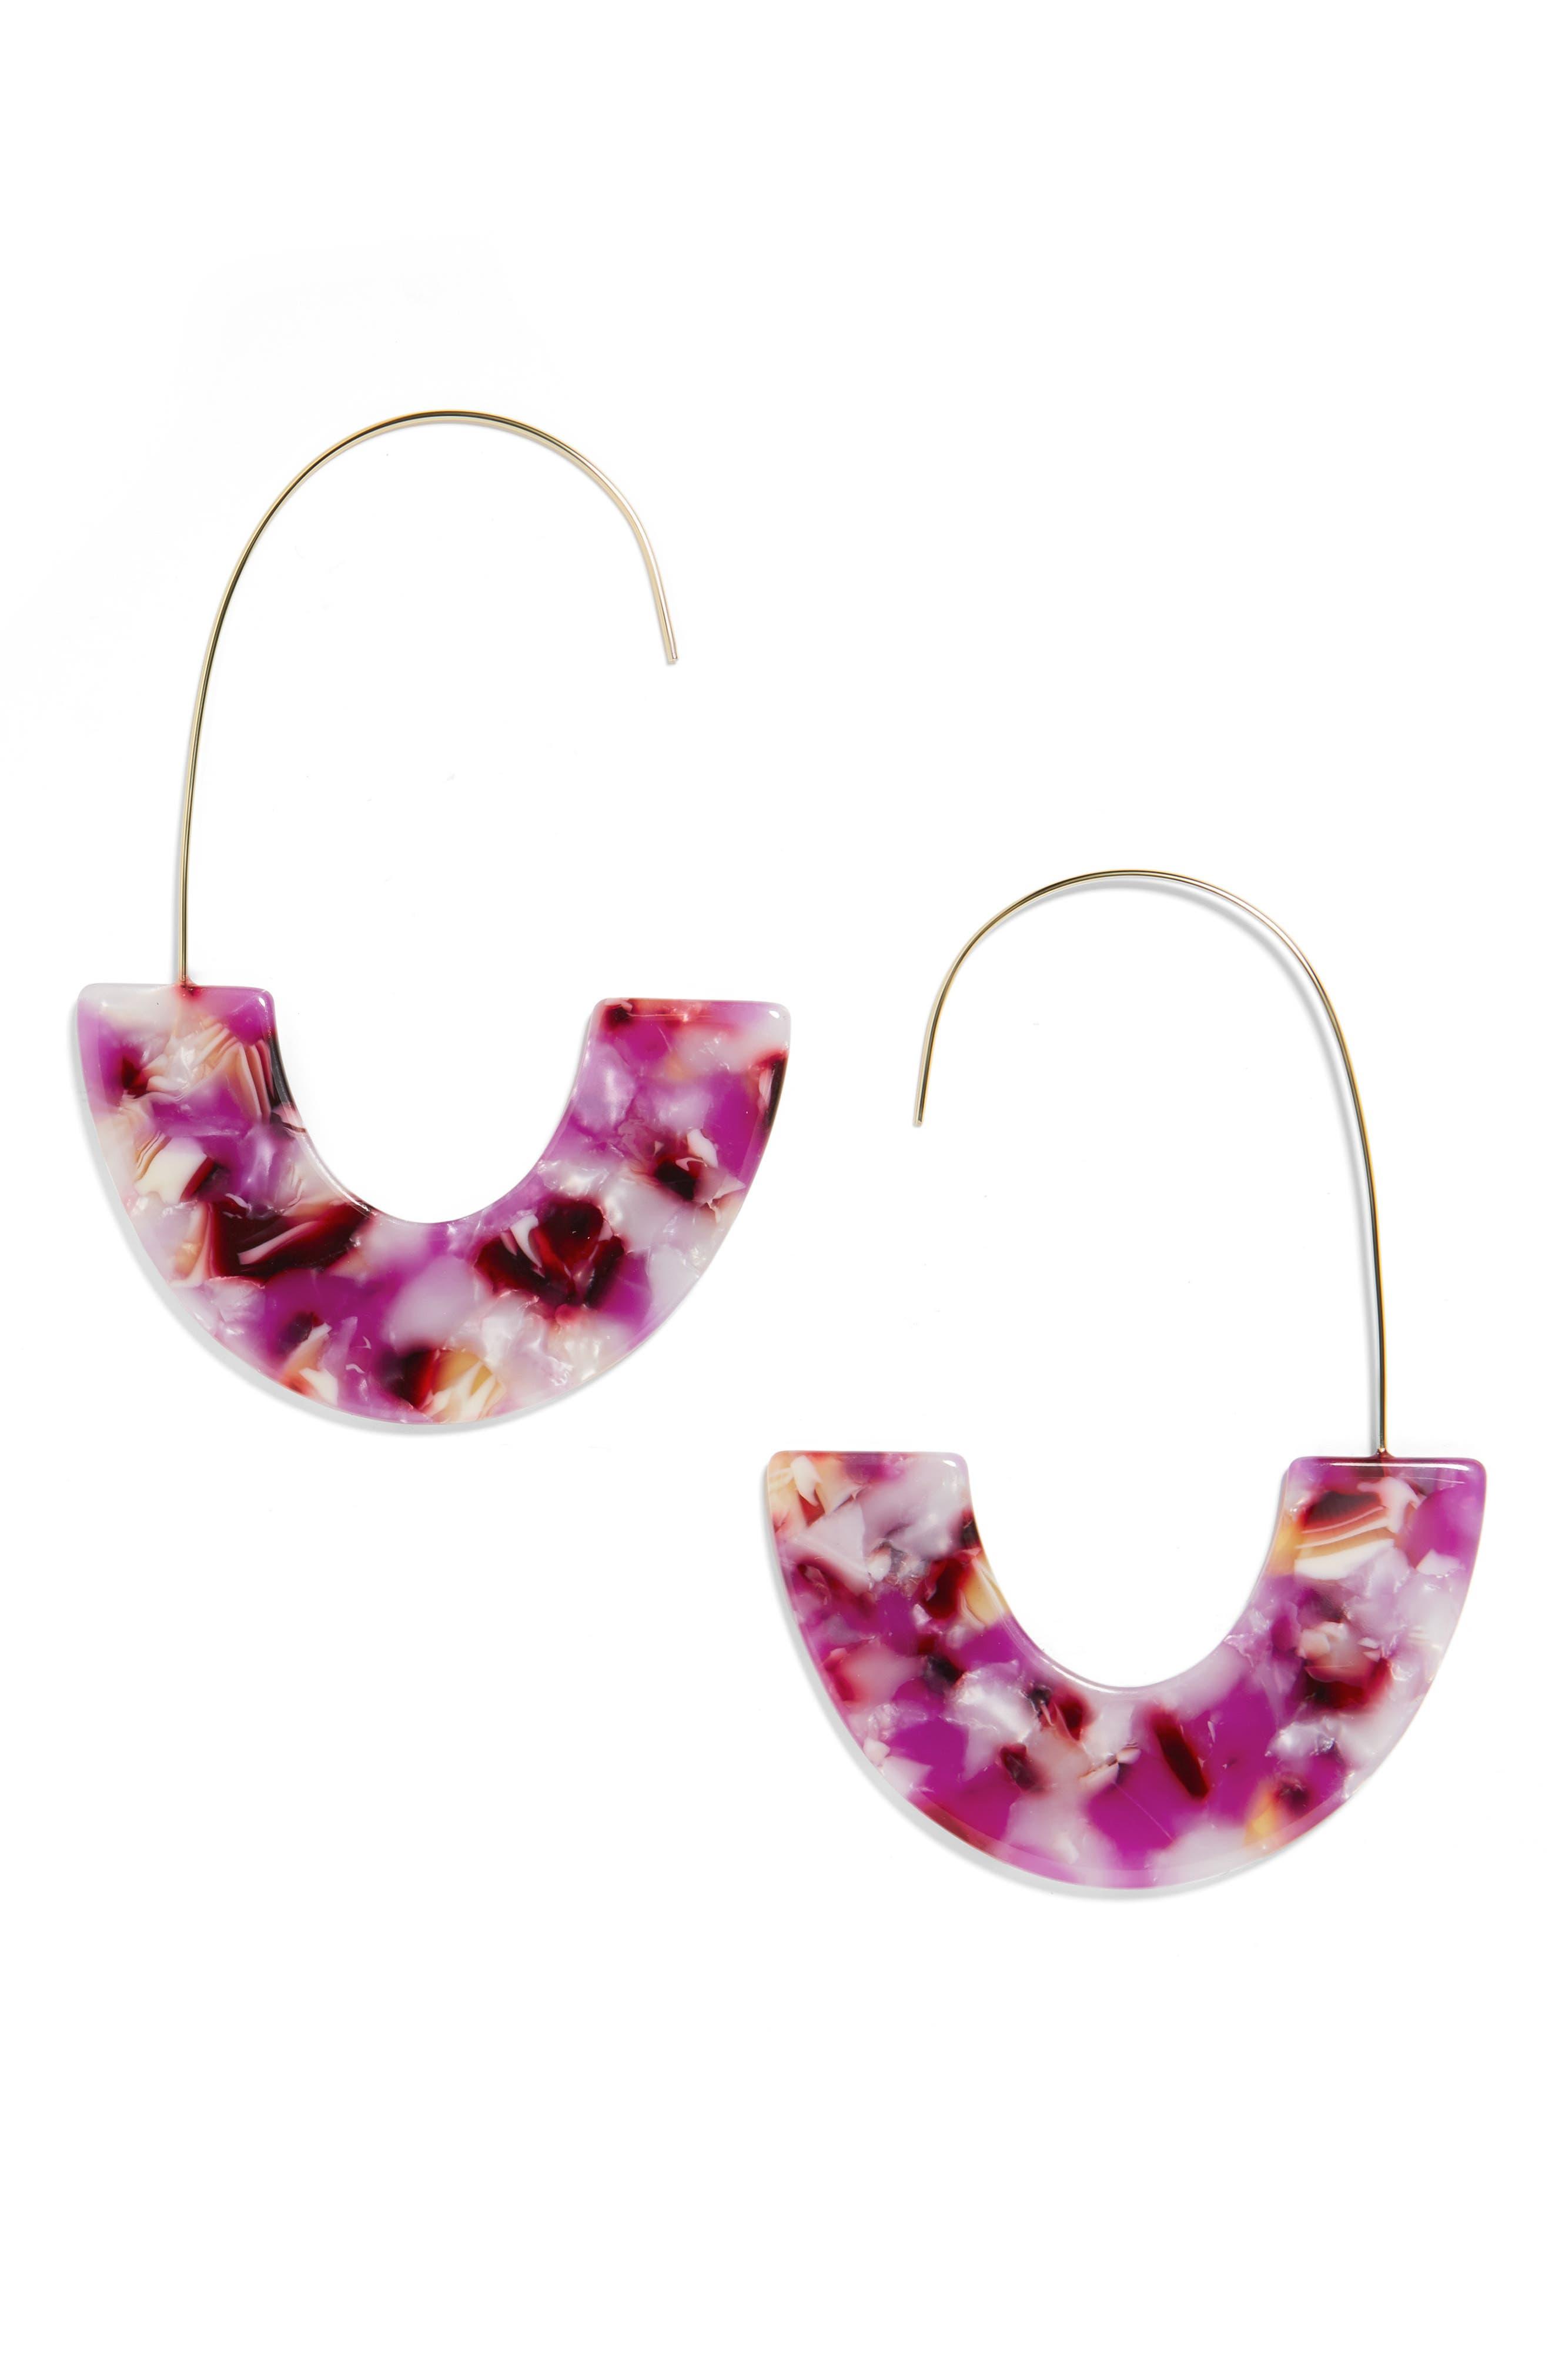 BAUBLEBAR Faidra Thin Drop Acrylic Oval Hoop Earrings in Lilac